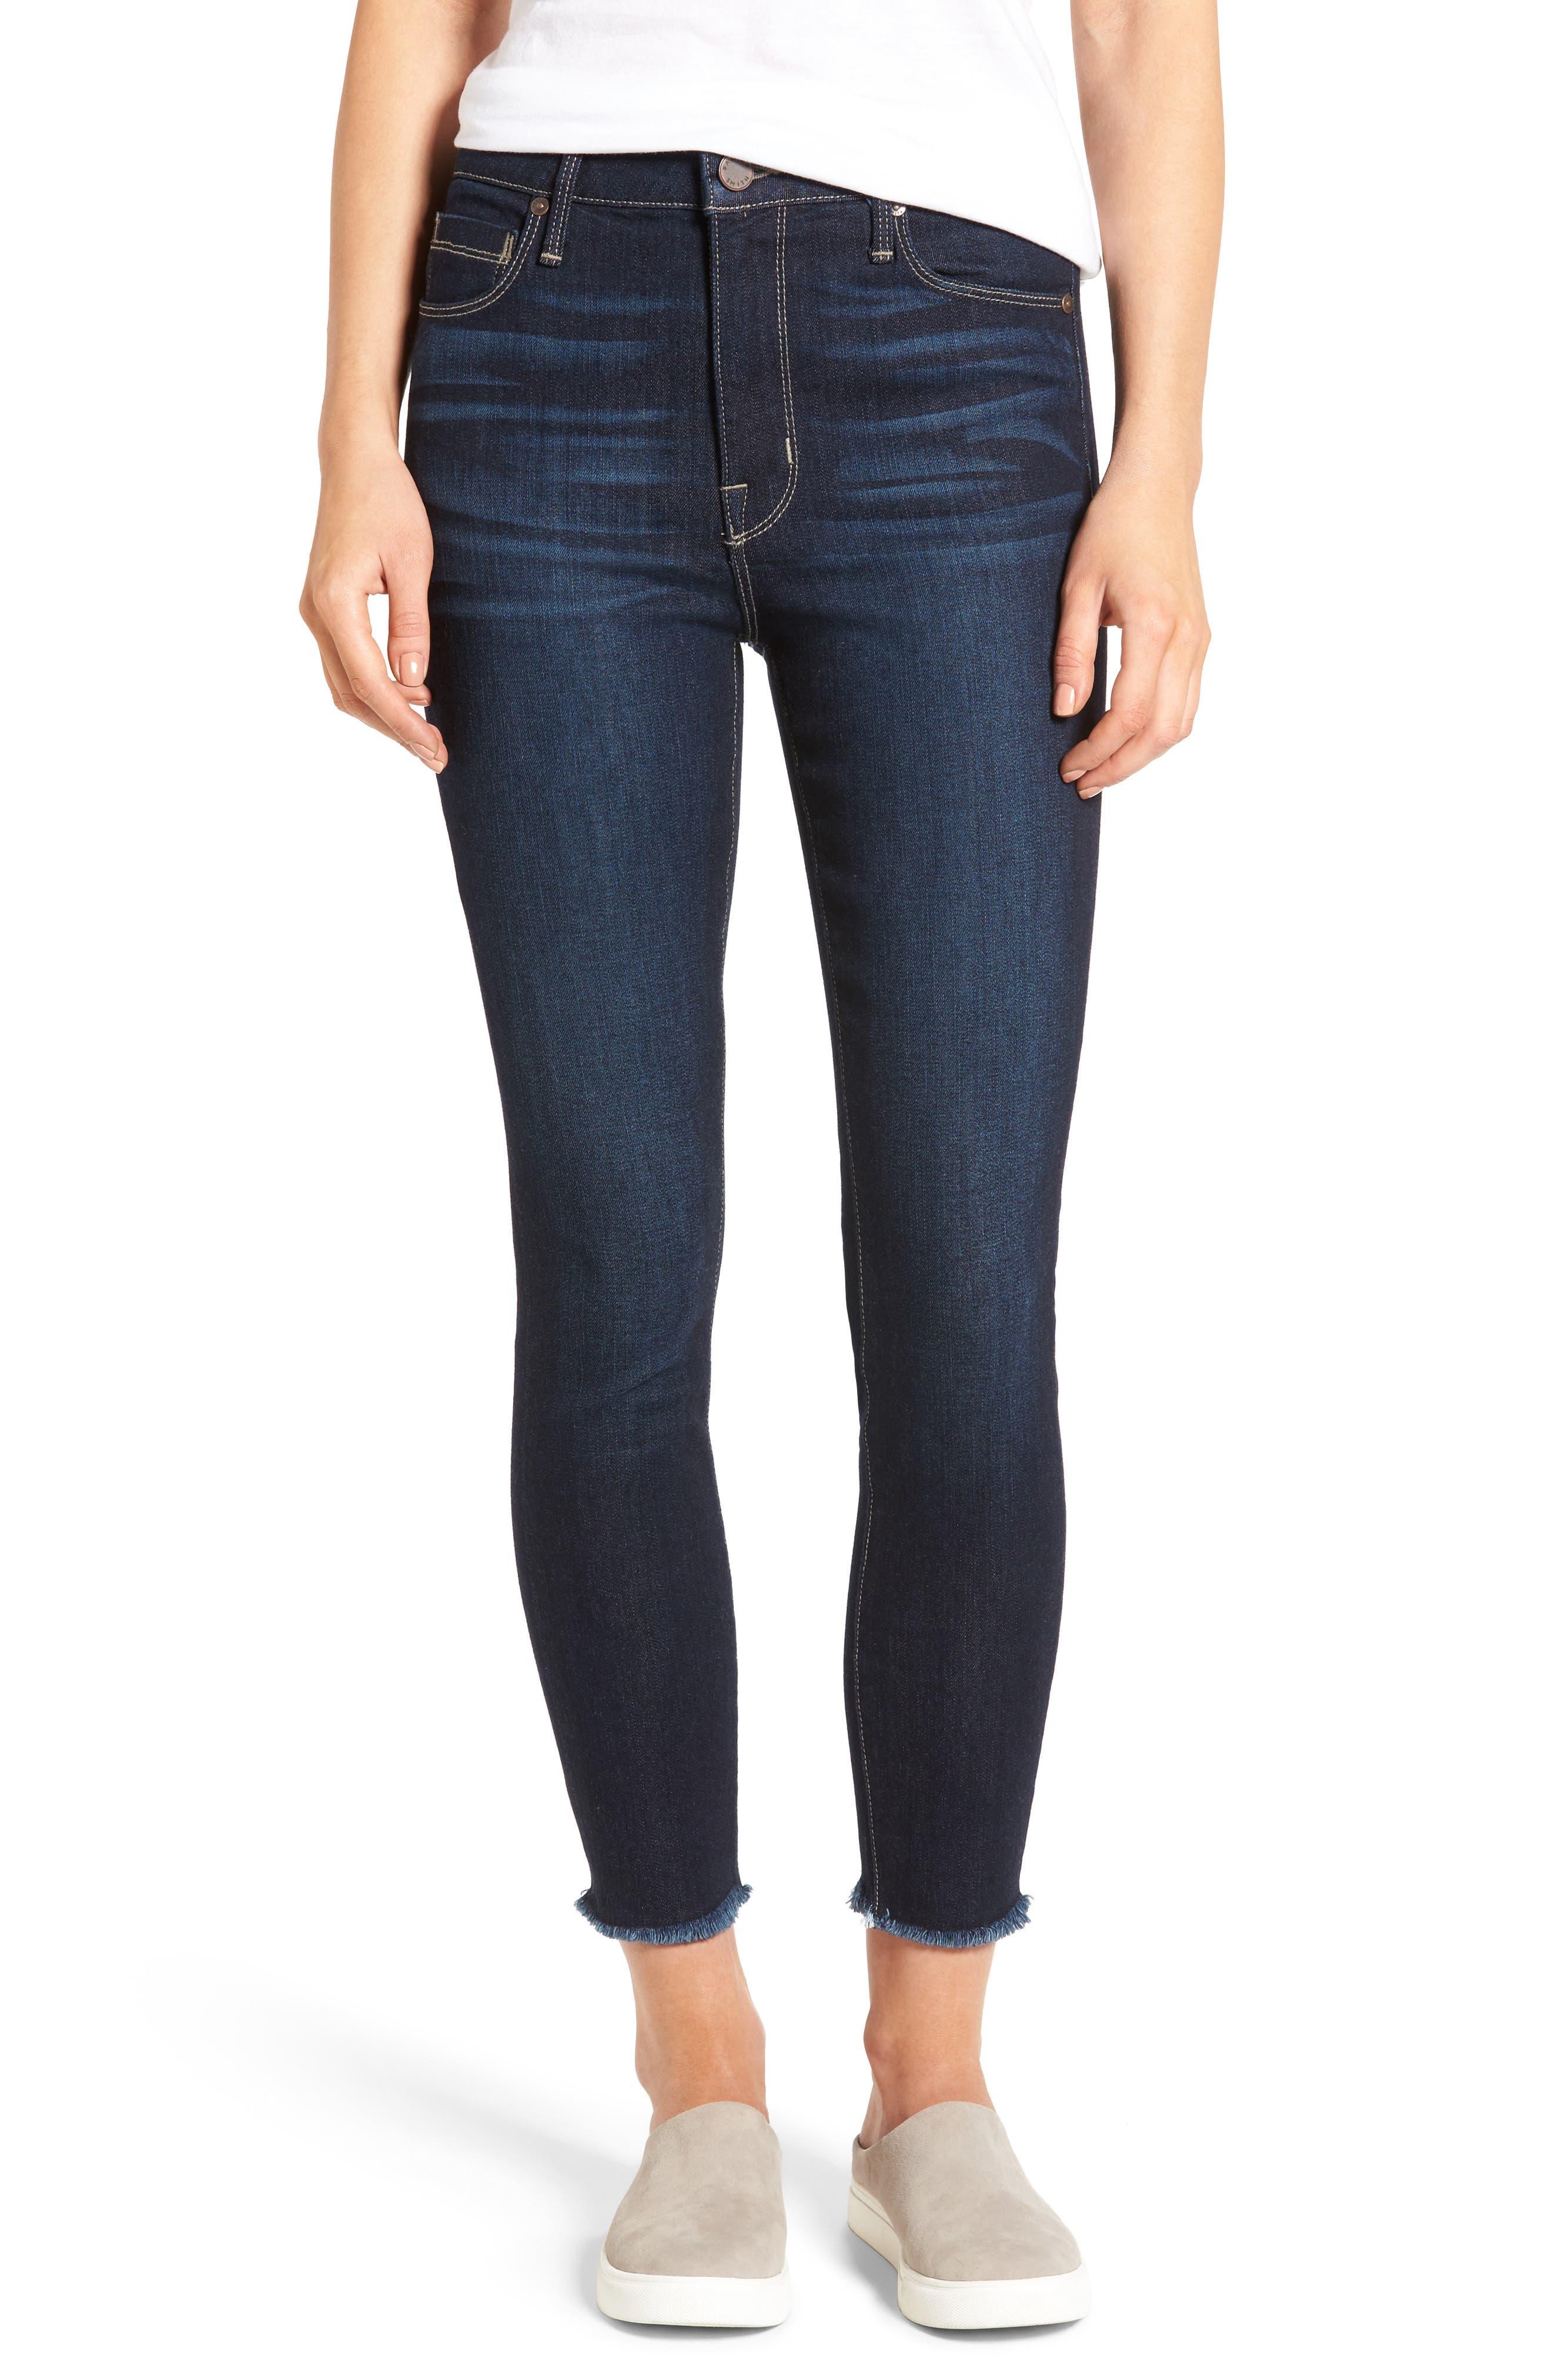 Main Image - PARKER SMITH Bombshell Raw Hem Stretch Skinny Jeans (Horizon)